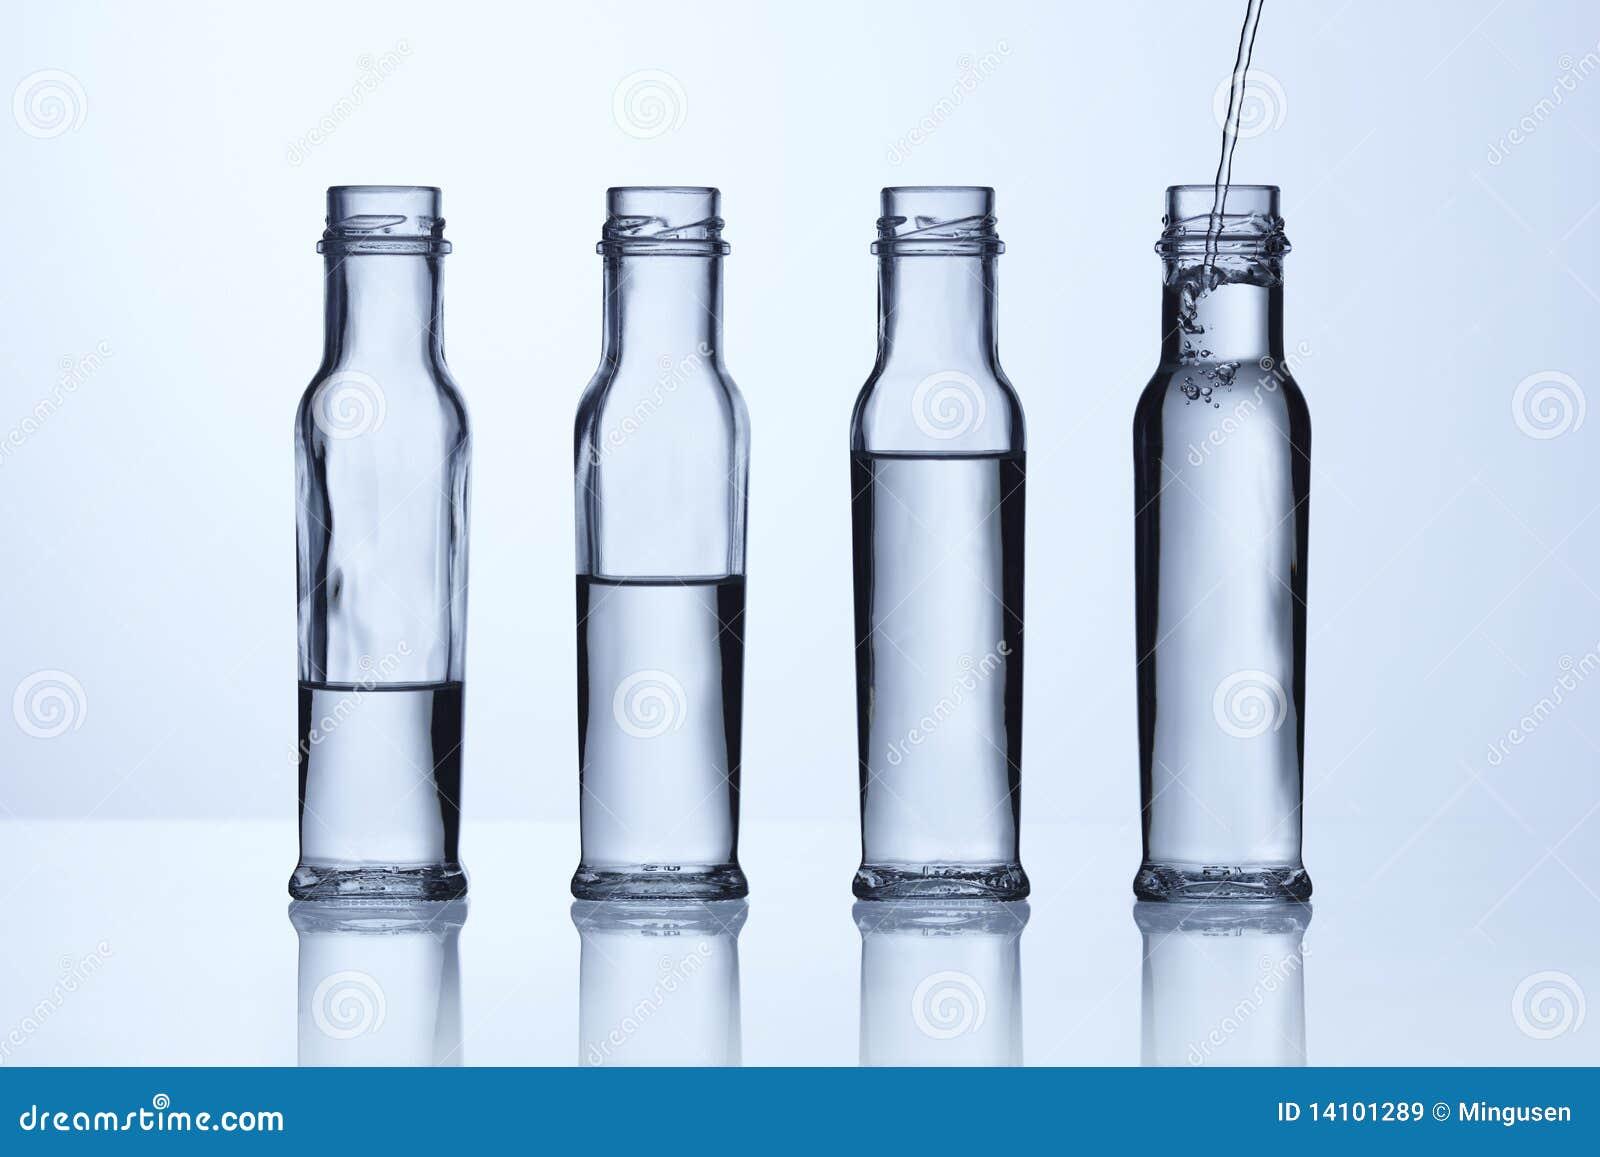 Botella de cristal con diversos niveles del agua imagen de for Botellas de cristal ikea